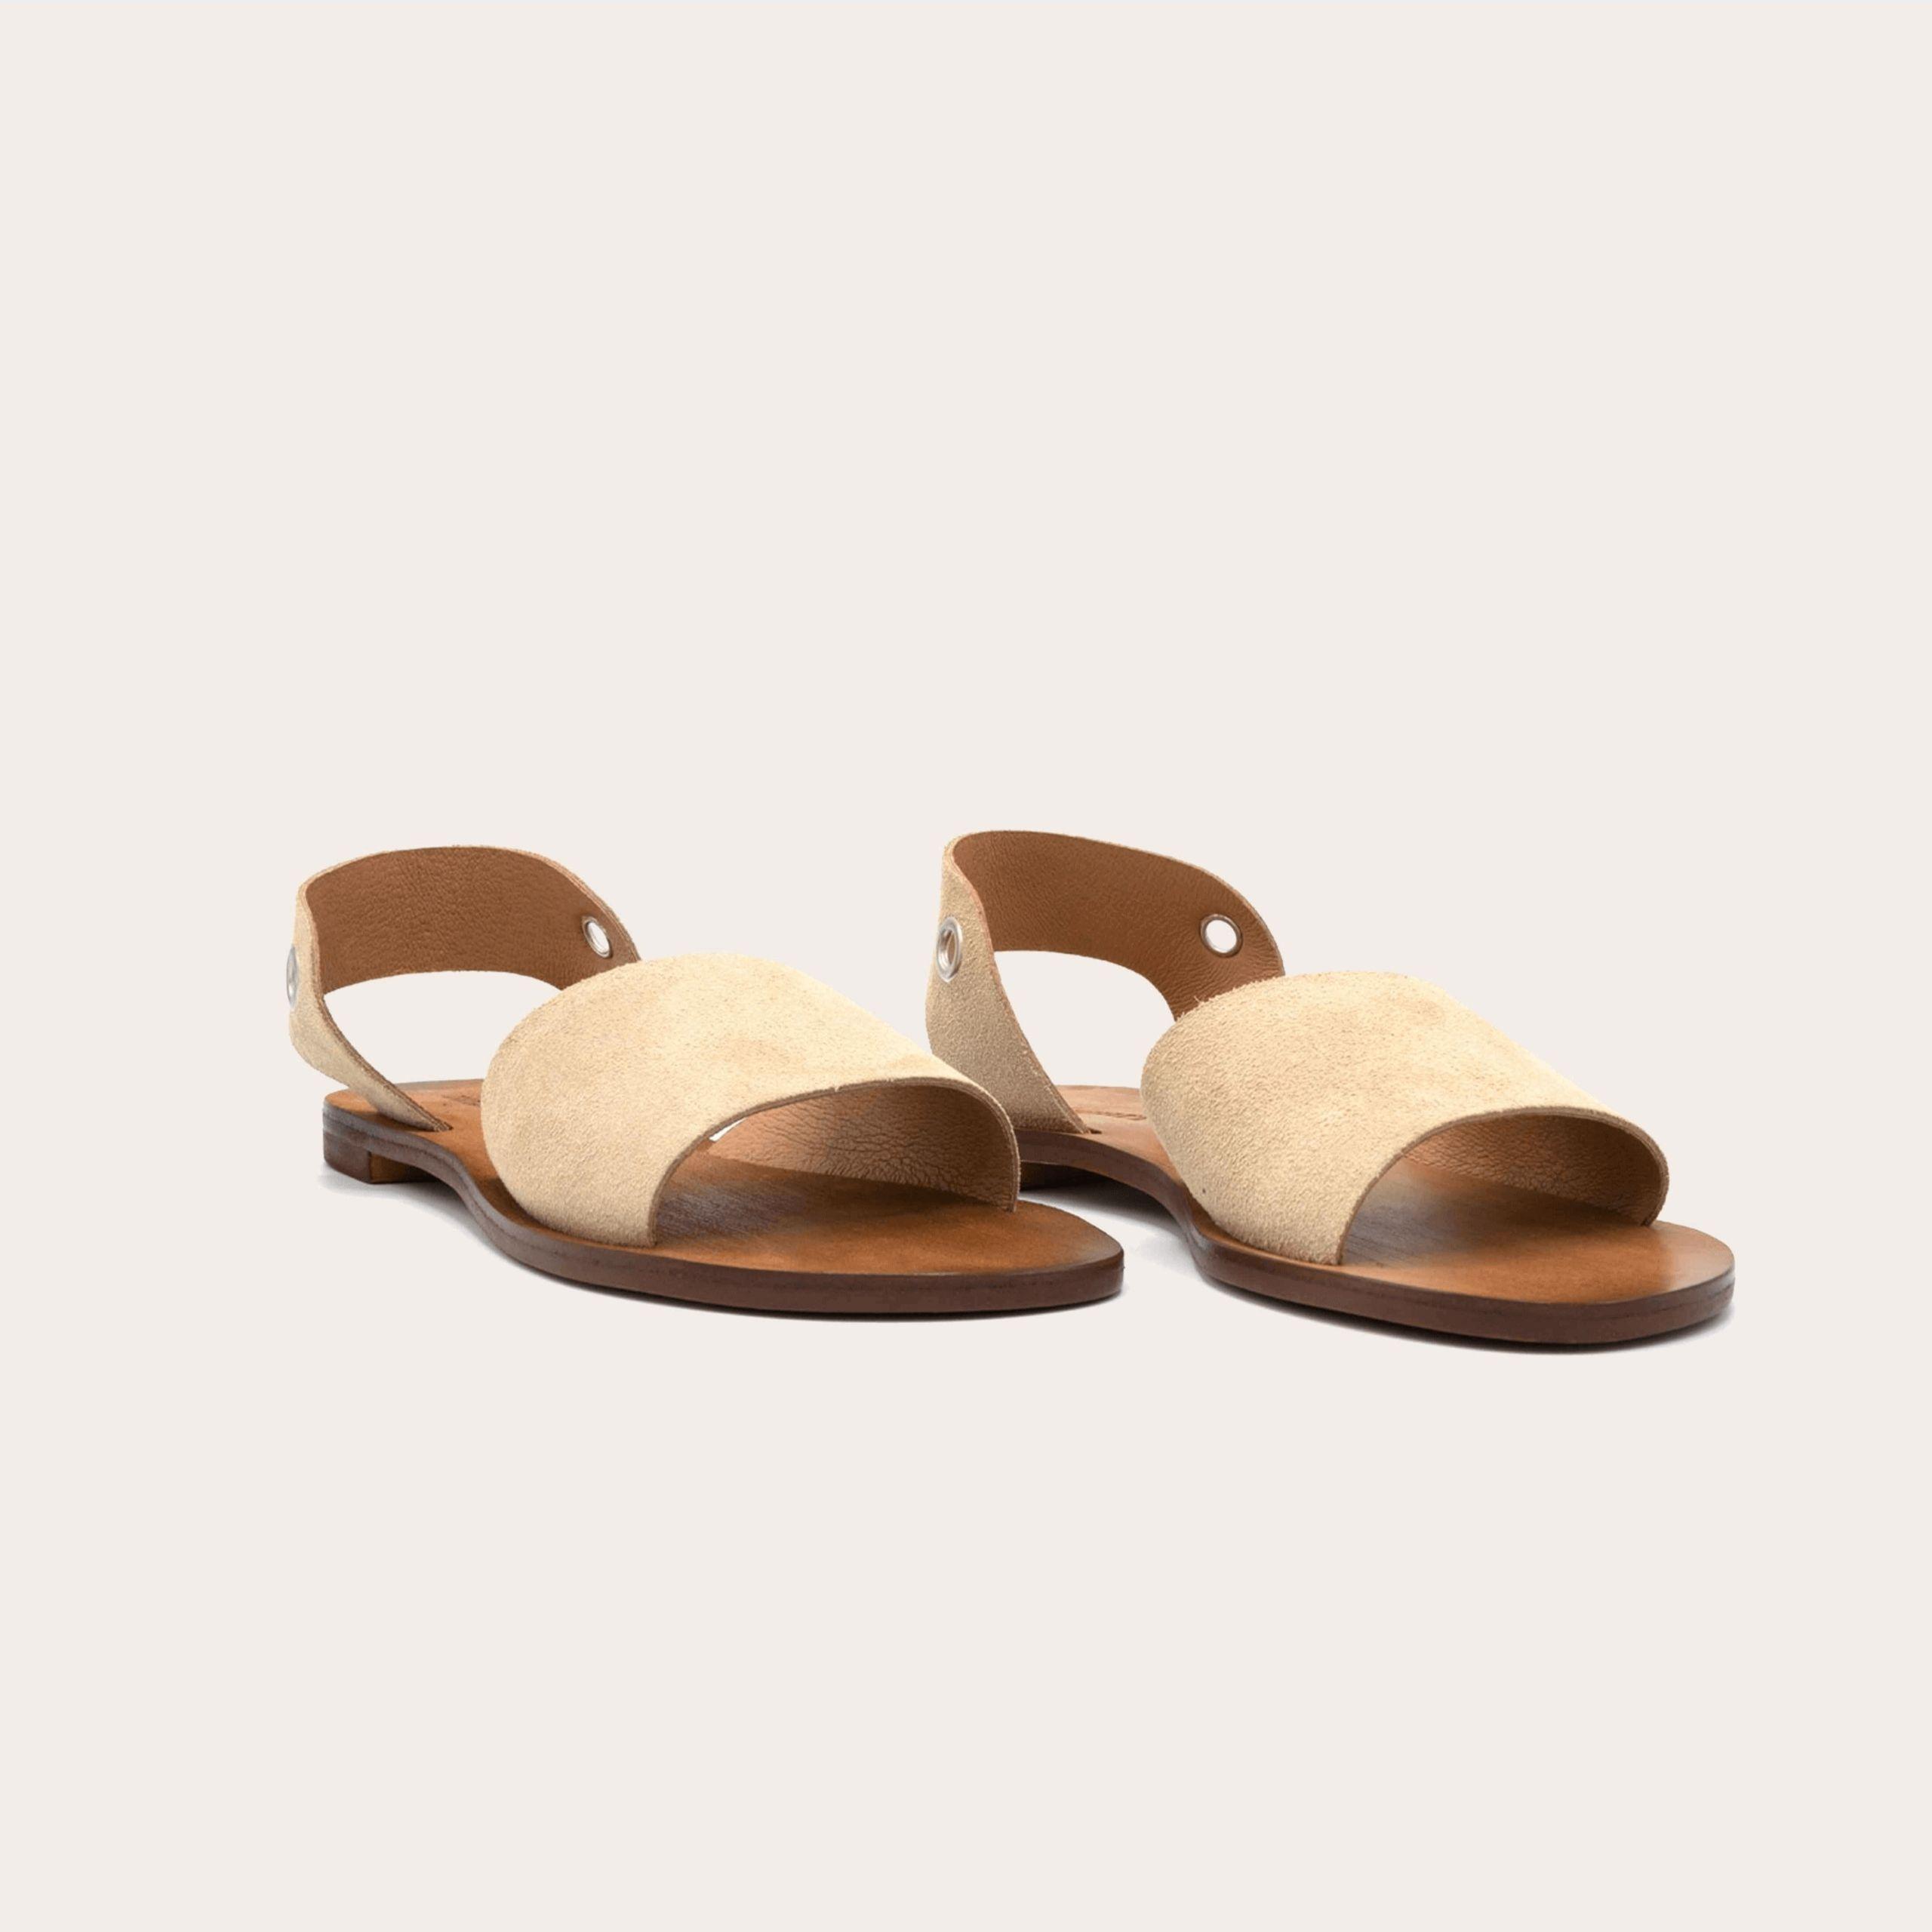 acapulco-beige_3_lintsandalen sandals travelsandals vegan sustainable sandals wikkelsandalen